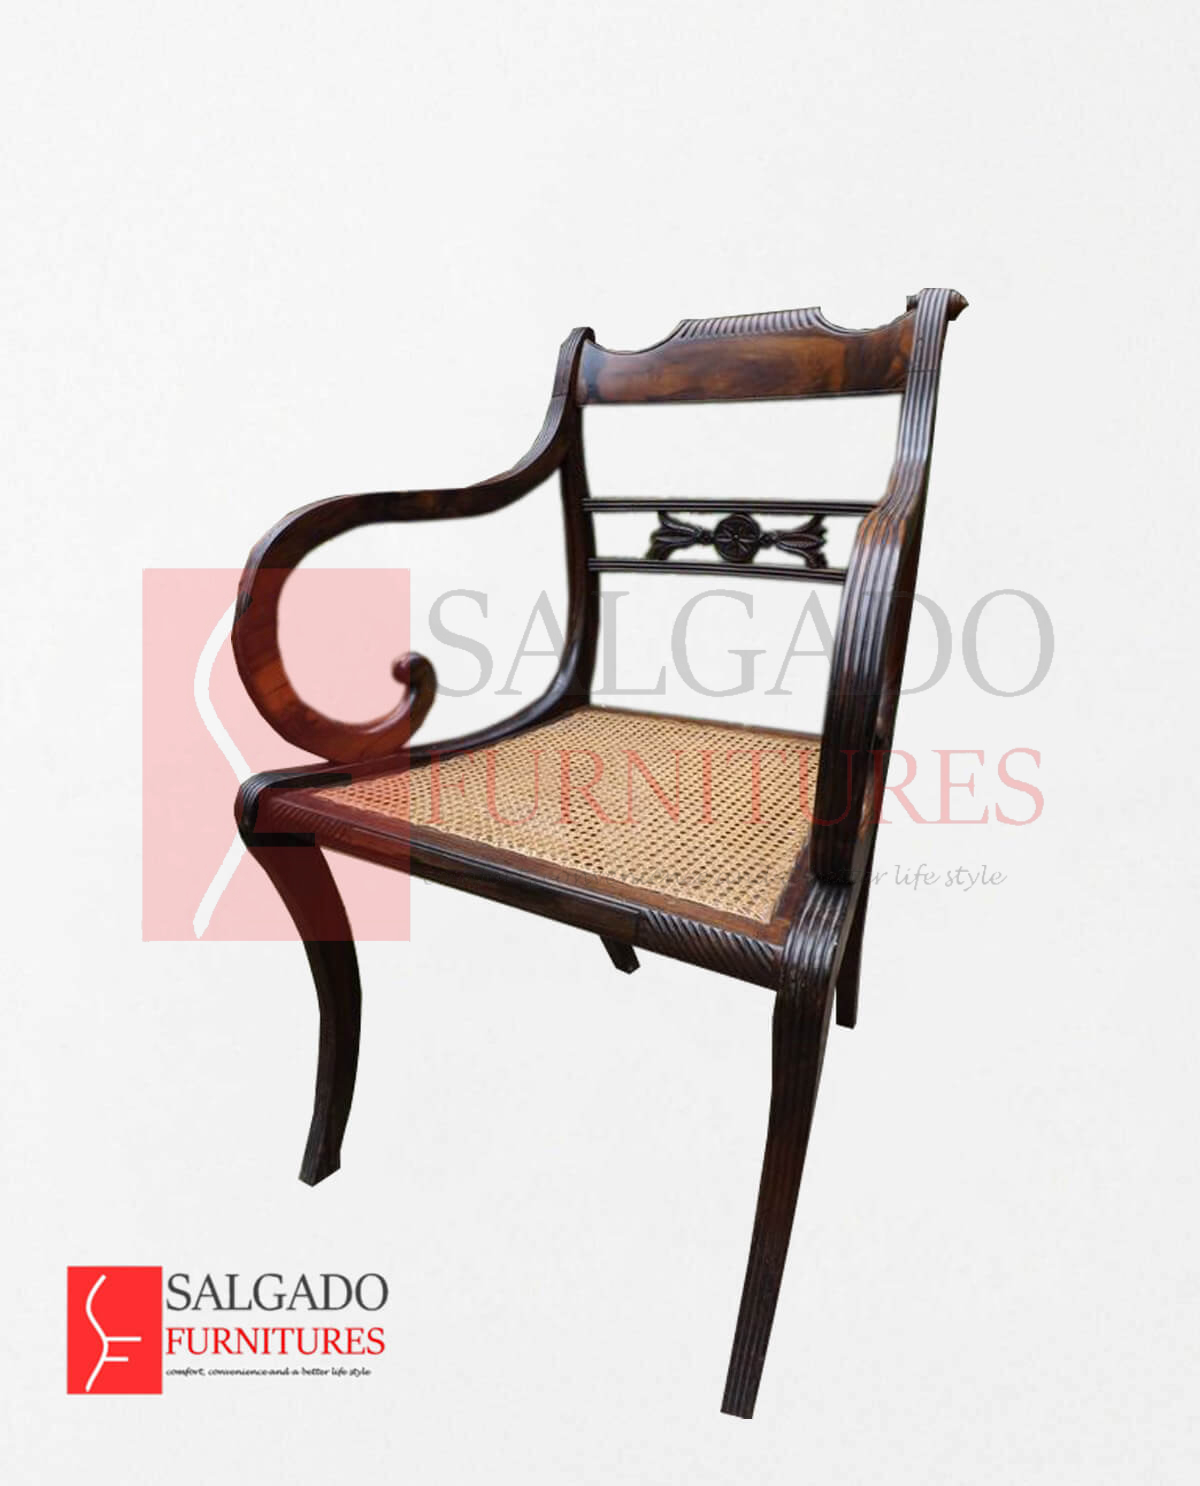 varandha-chair-srilanka-antique